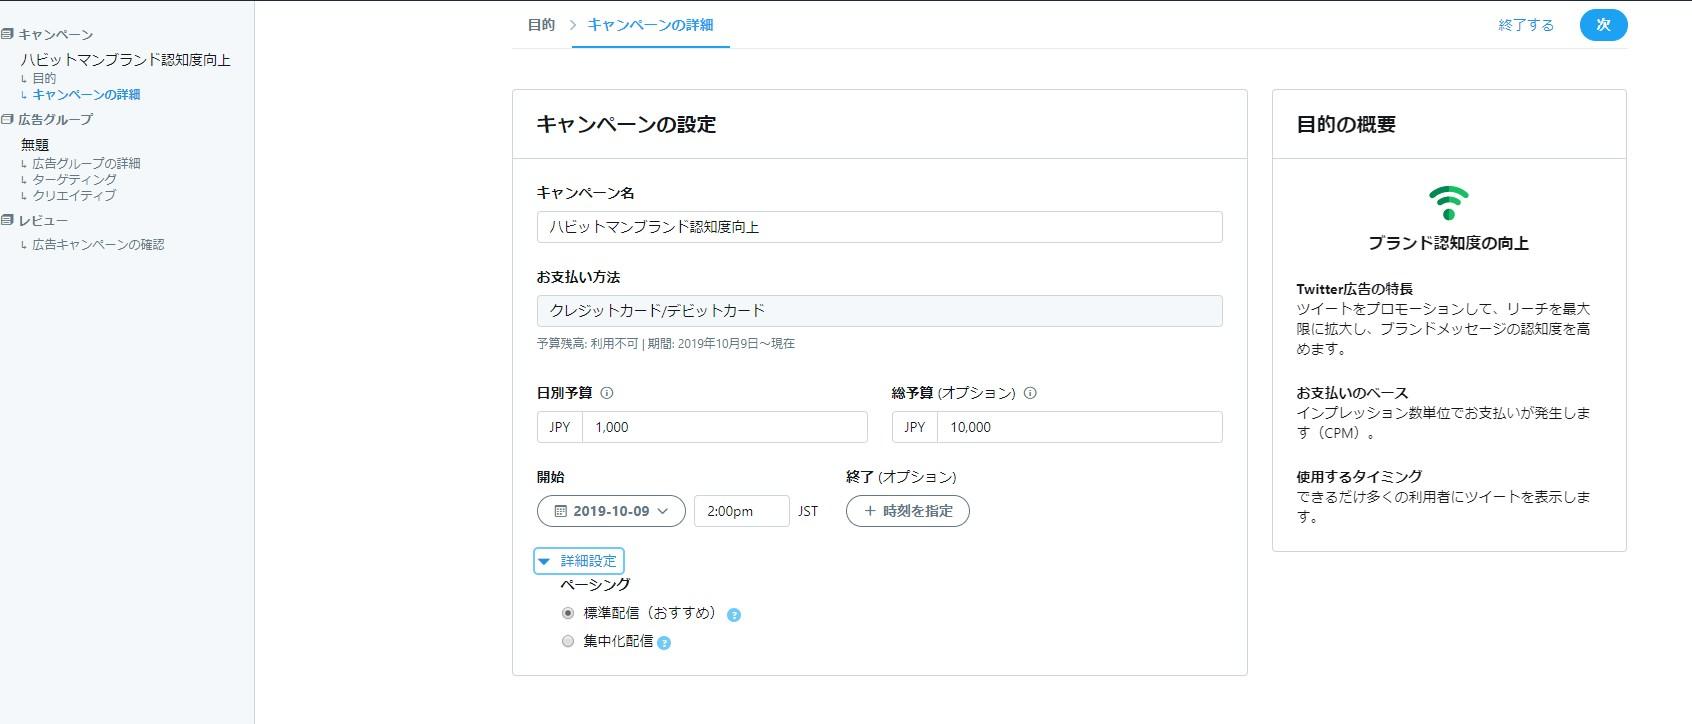 Tiwtter広告キャンペーン設定